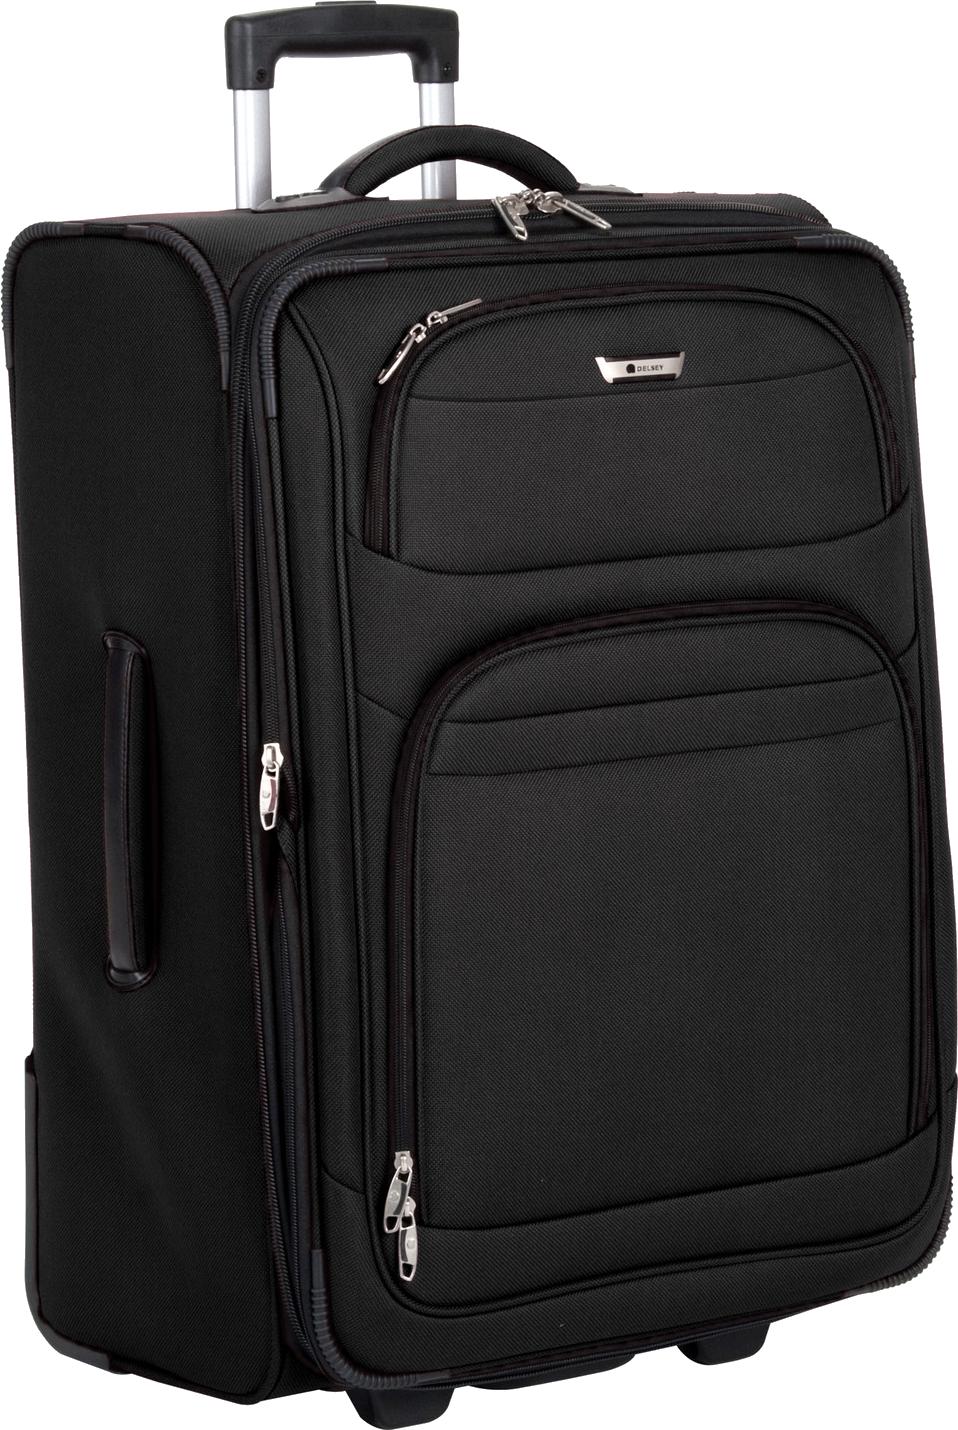 Black luggage PNG image